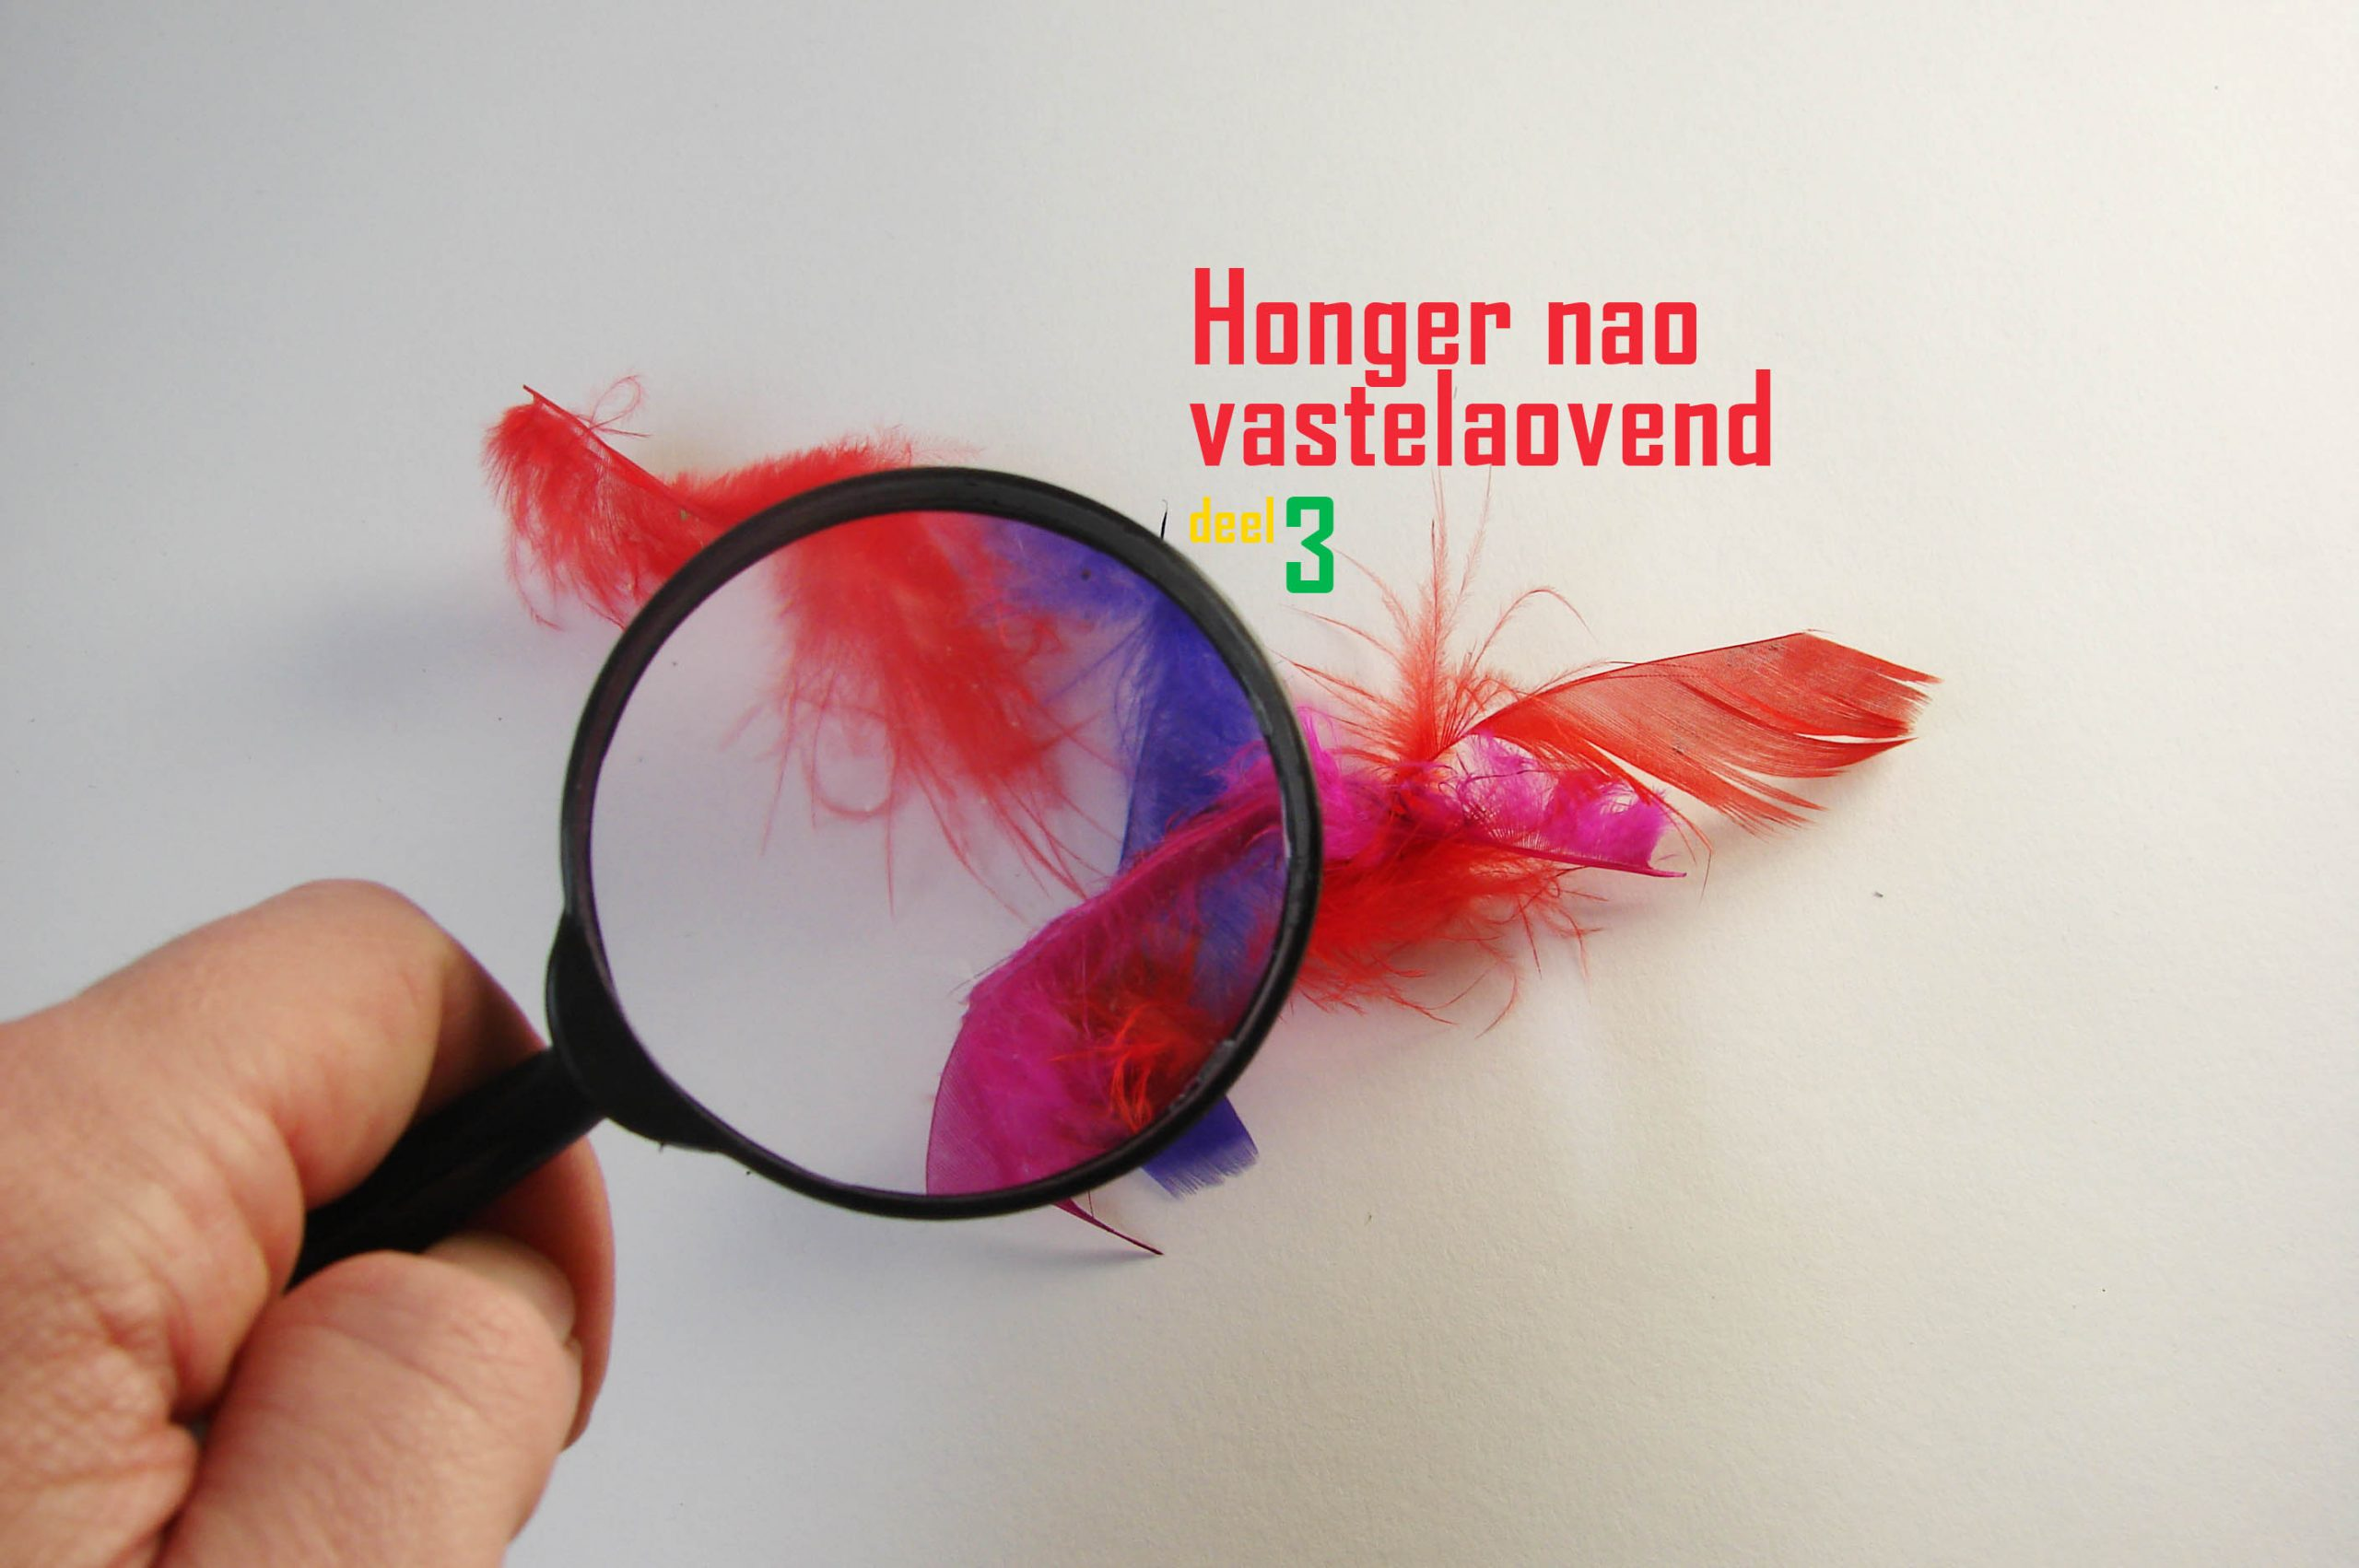 HNV loep 3